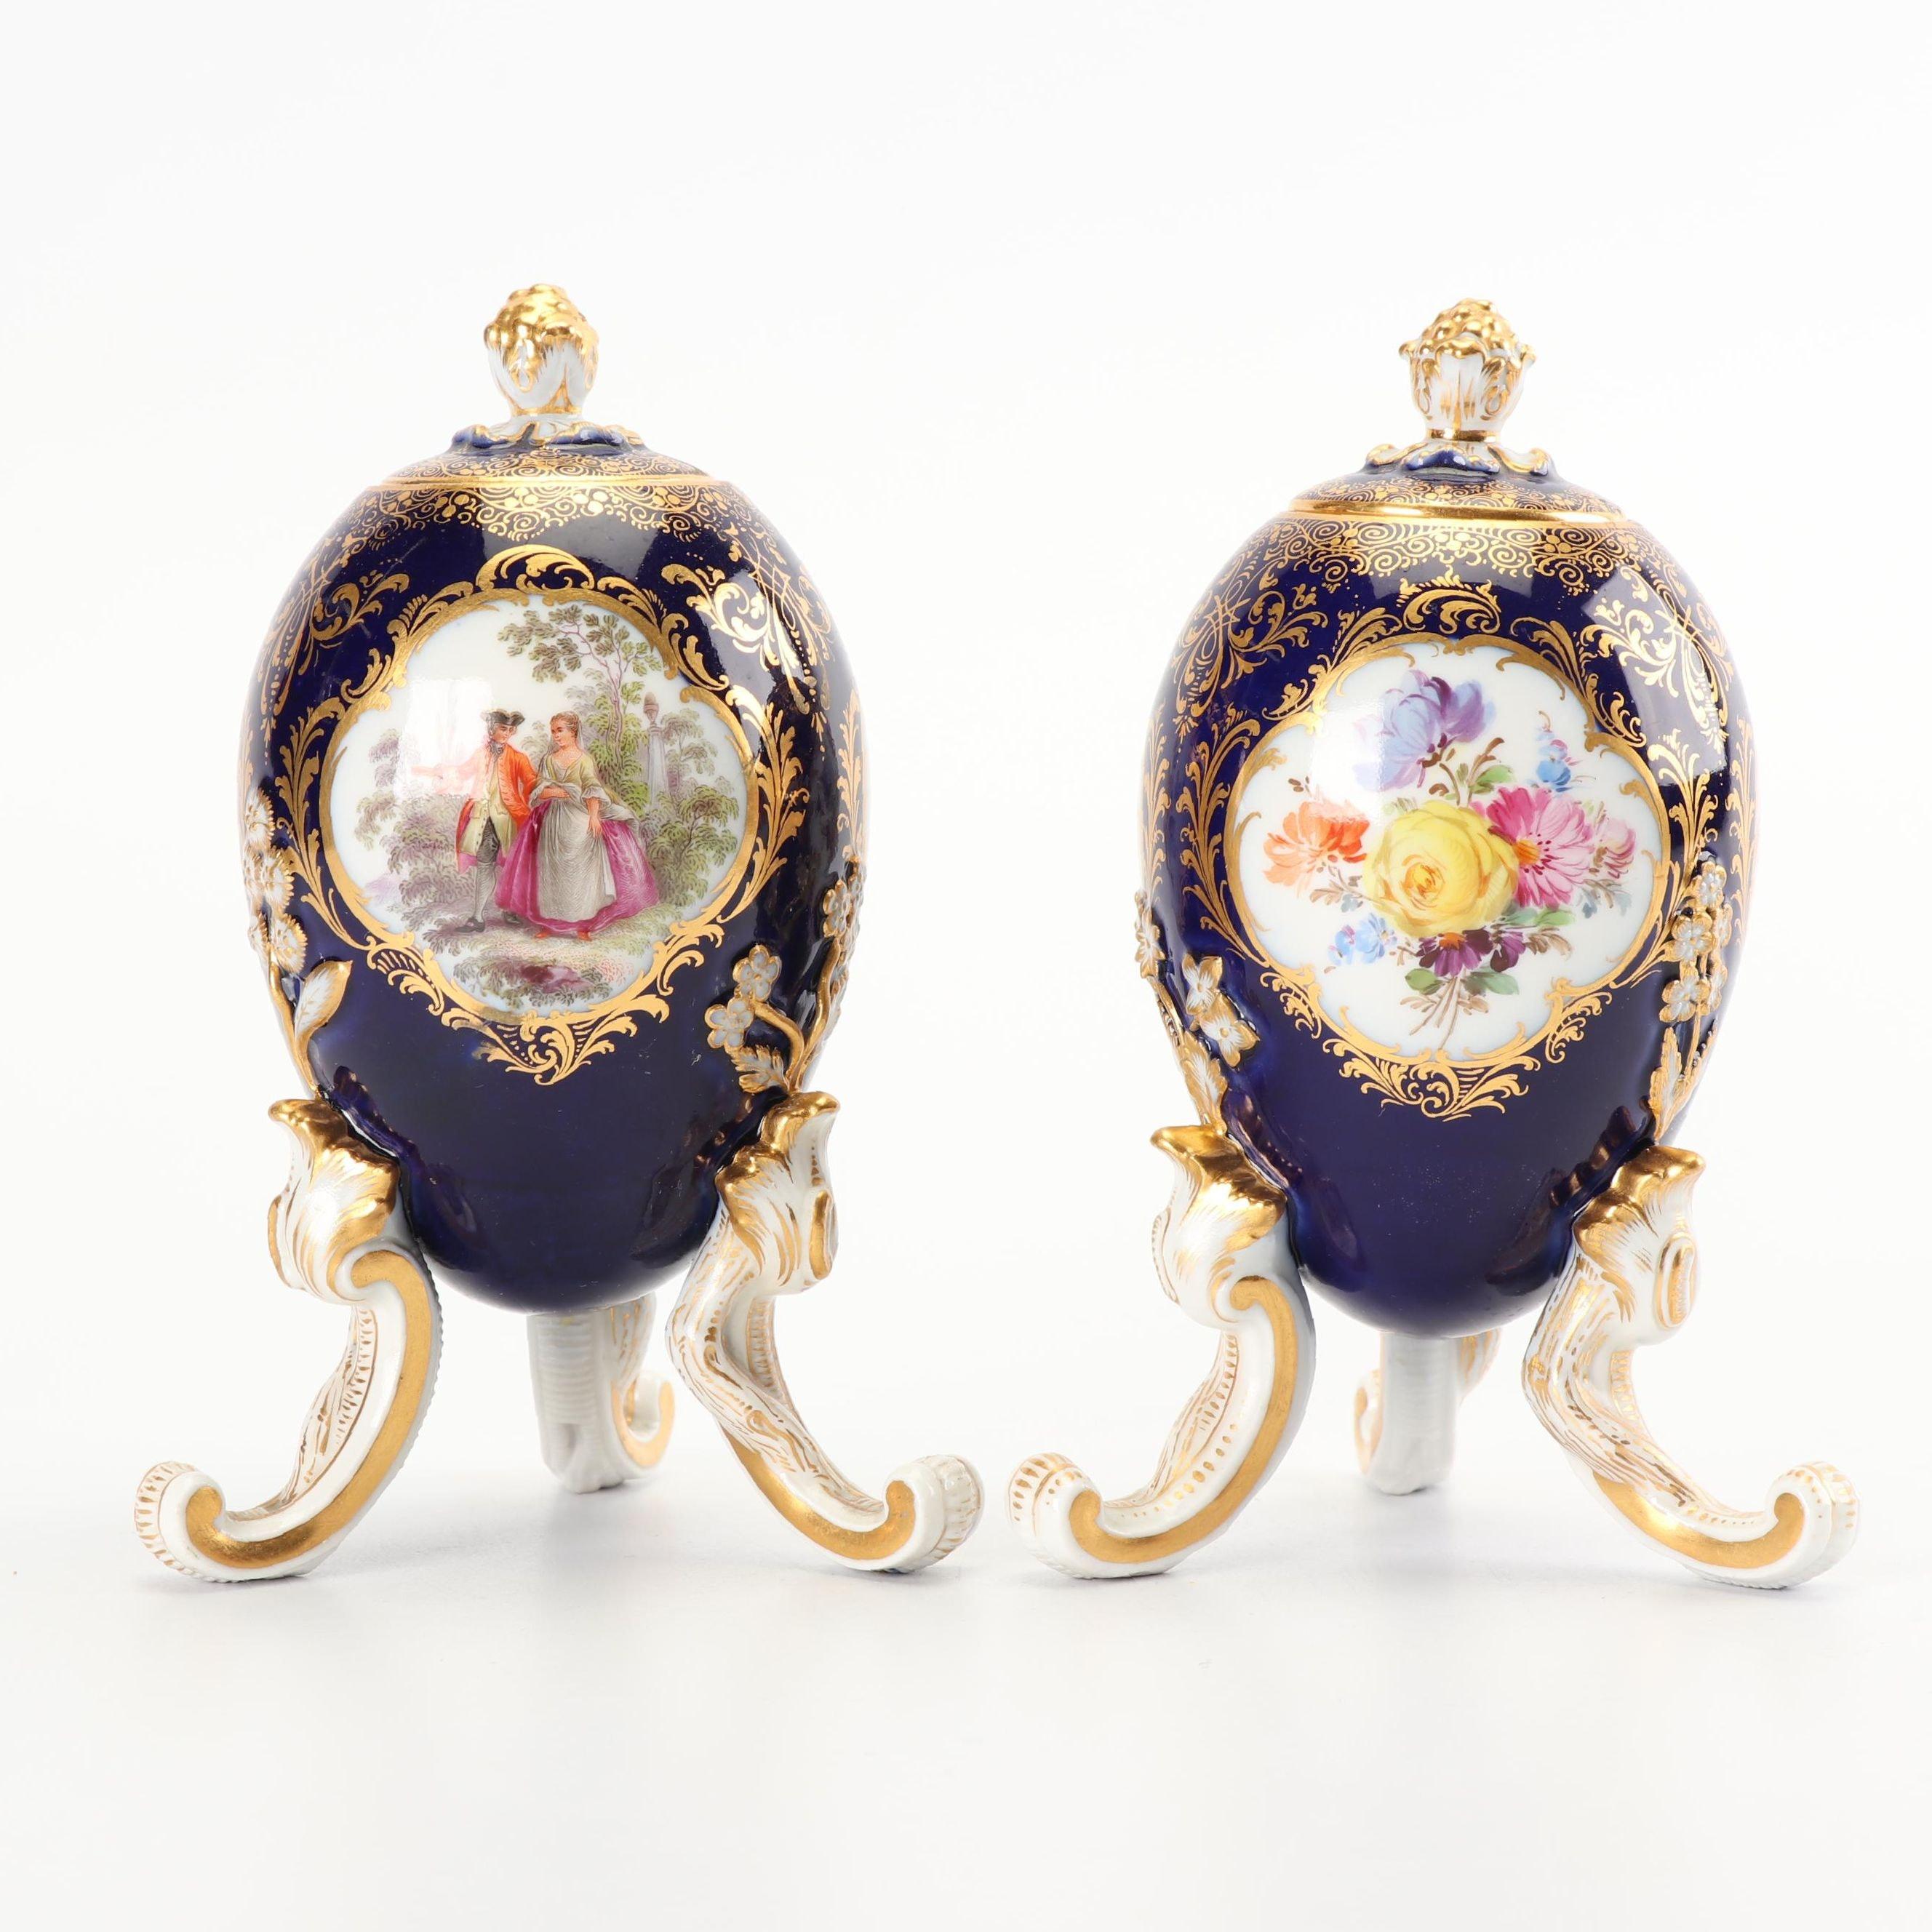 Meissen Porcelain Lidded Jars, Late 19th Century